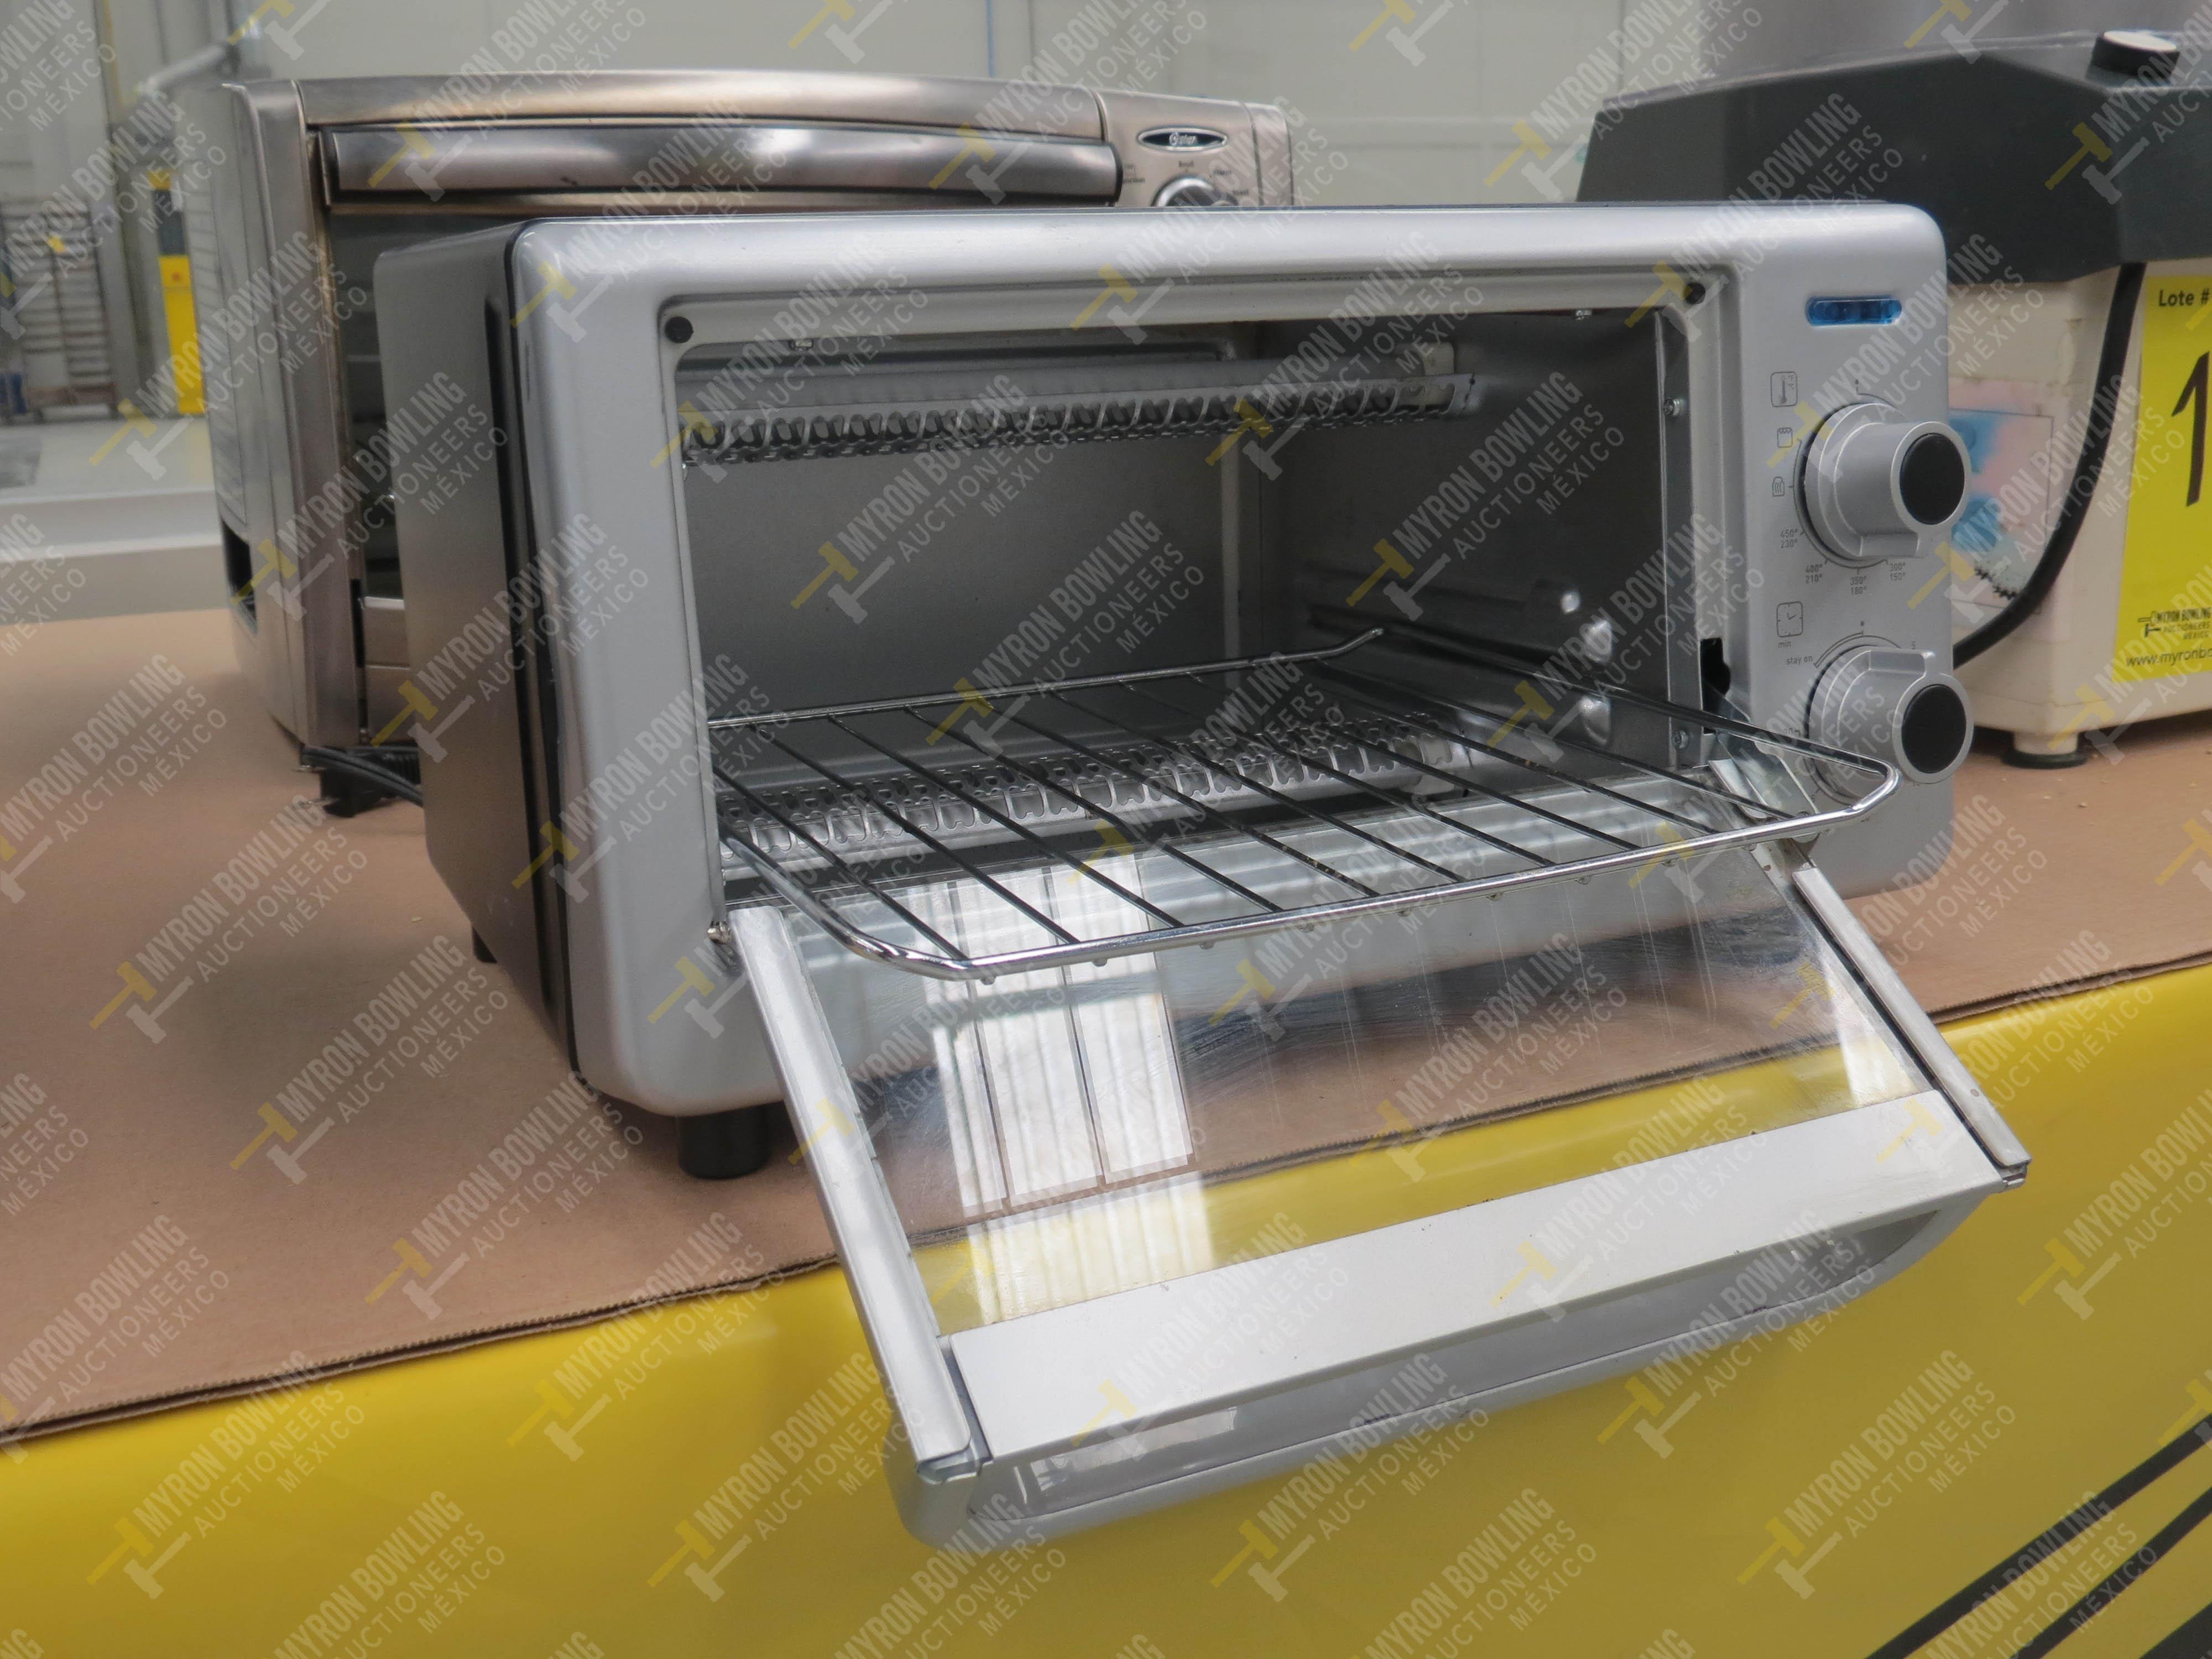 1 Horno eléctrico marca T-fal, Modelo OF160850 No. de Serie T066 y 1 Horno de microondas - Image 3 of 5